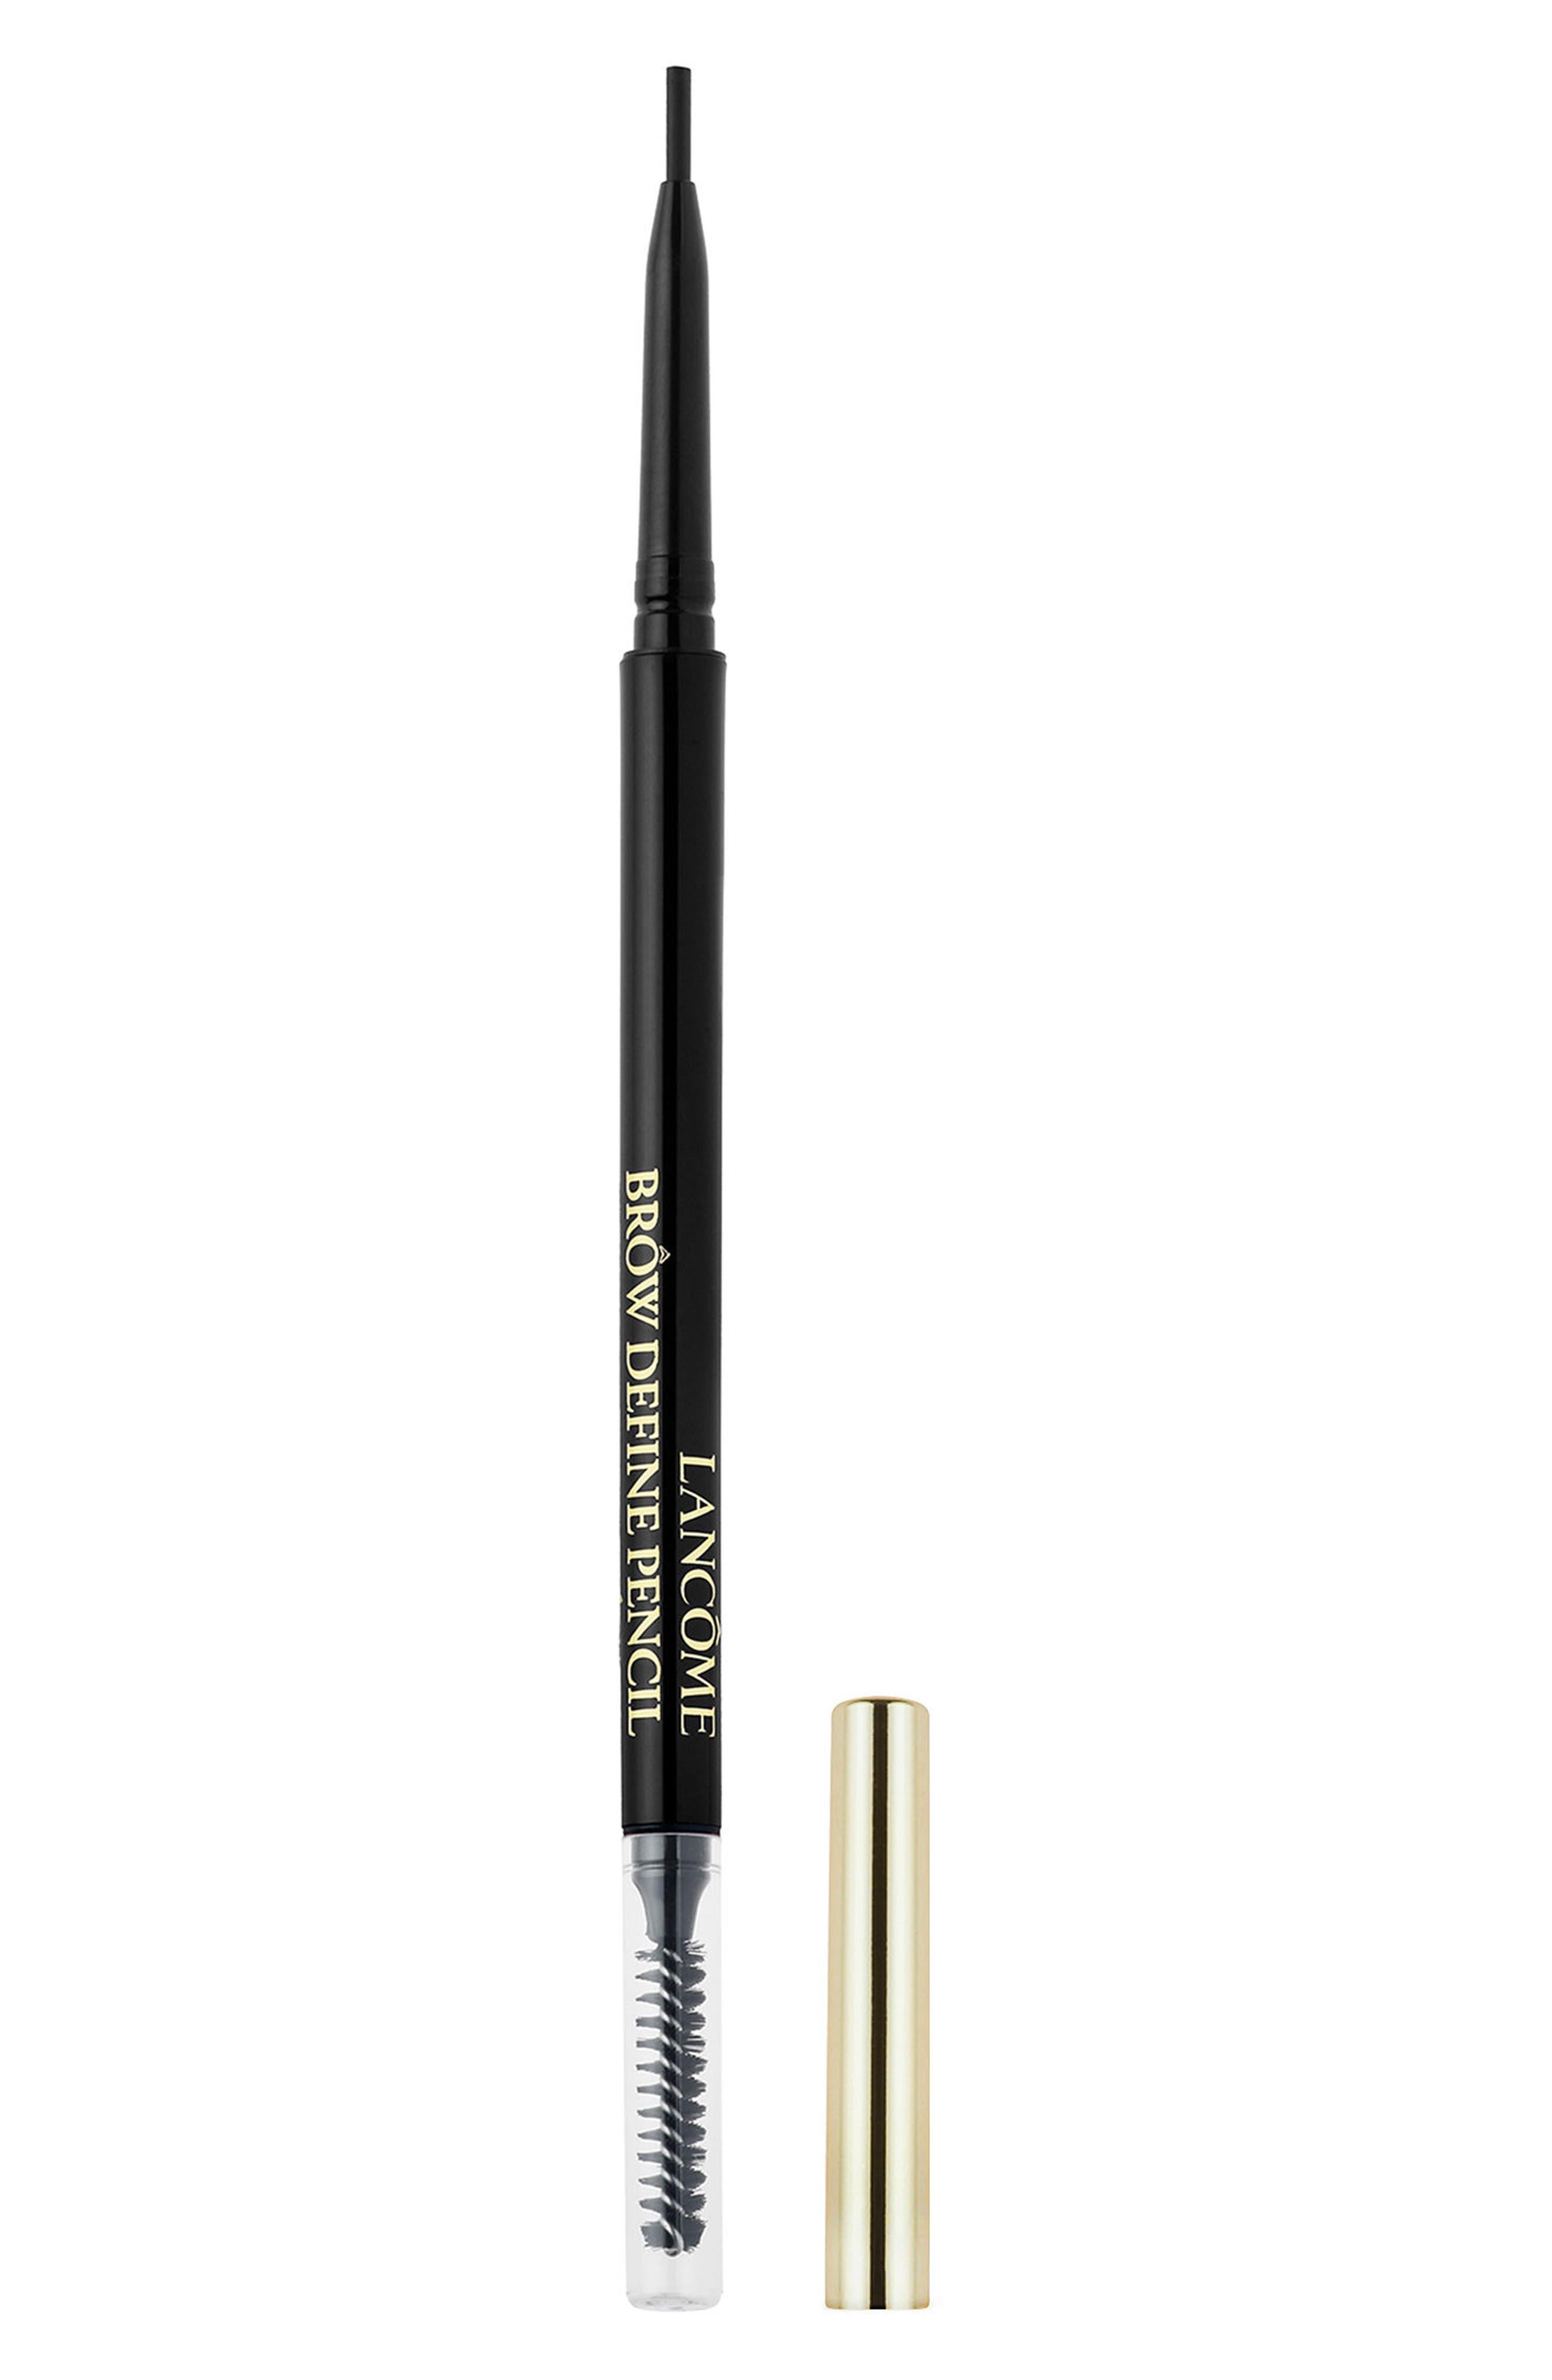 Brow Define Pencil,                             Main thumbnail 1, color,                             BLACK 14